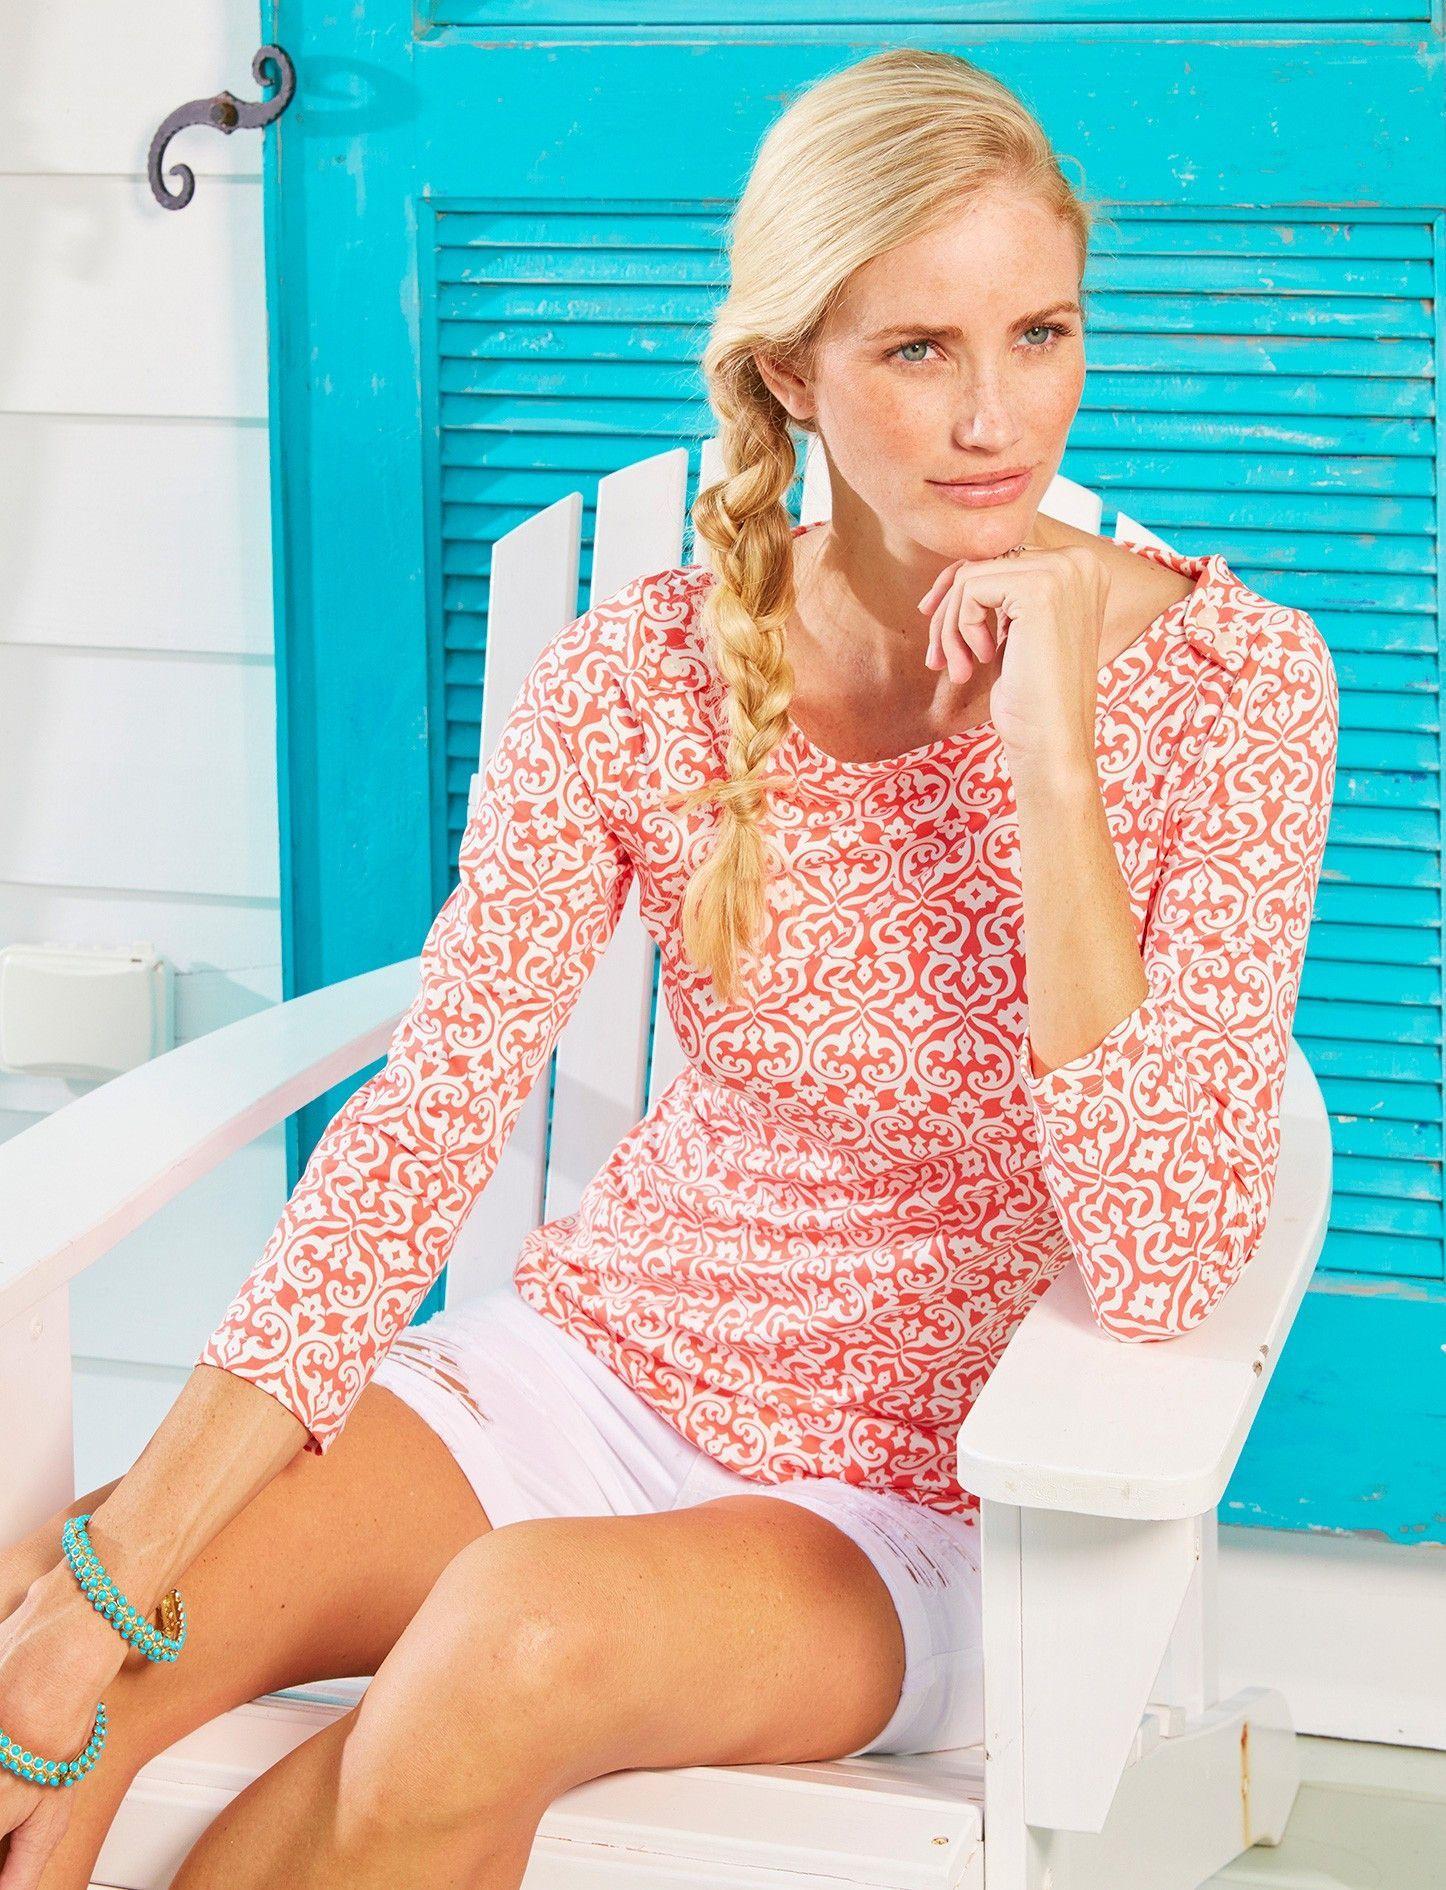 d0203fb61d Cabana Life Coral Seas Boat Neck Top | UV Clothing | Sun protective ...